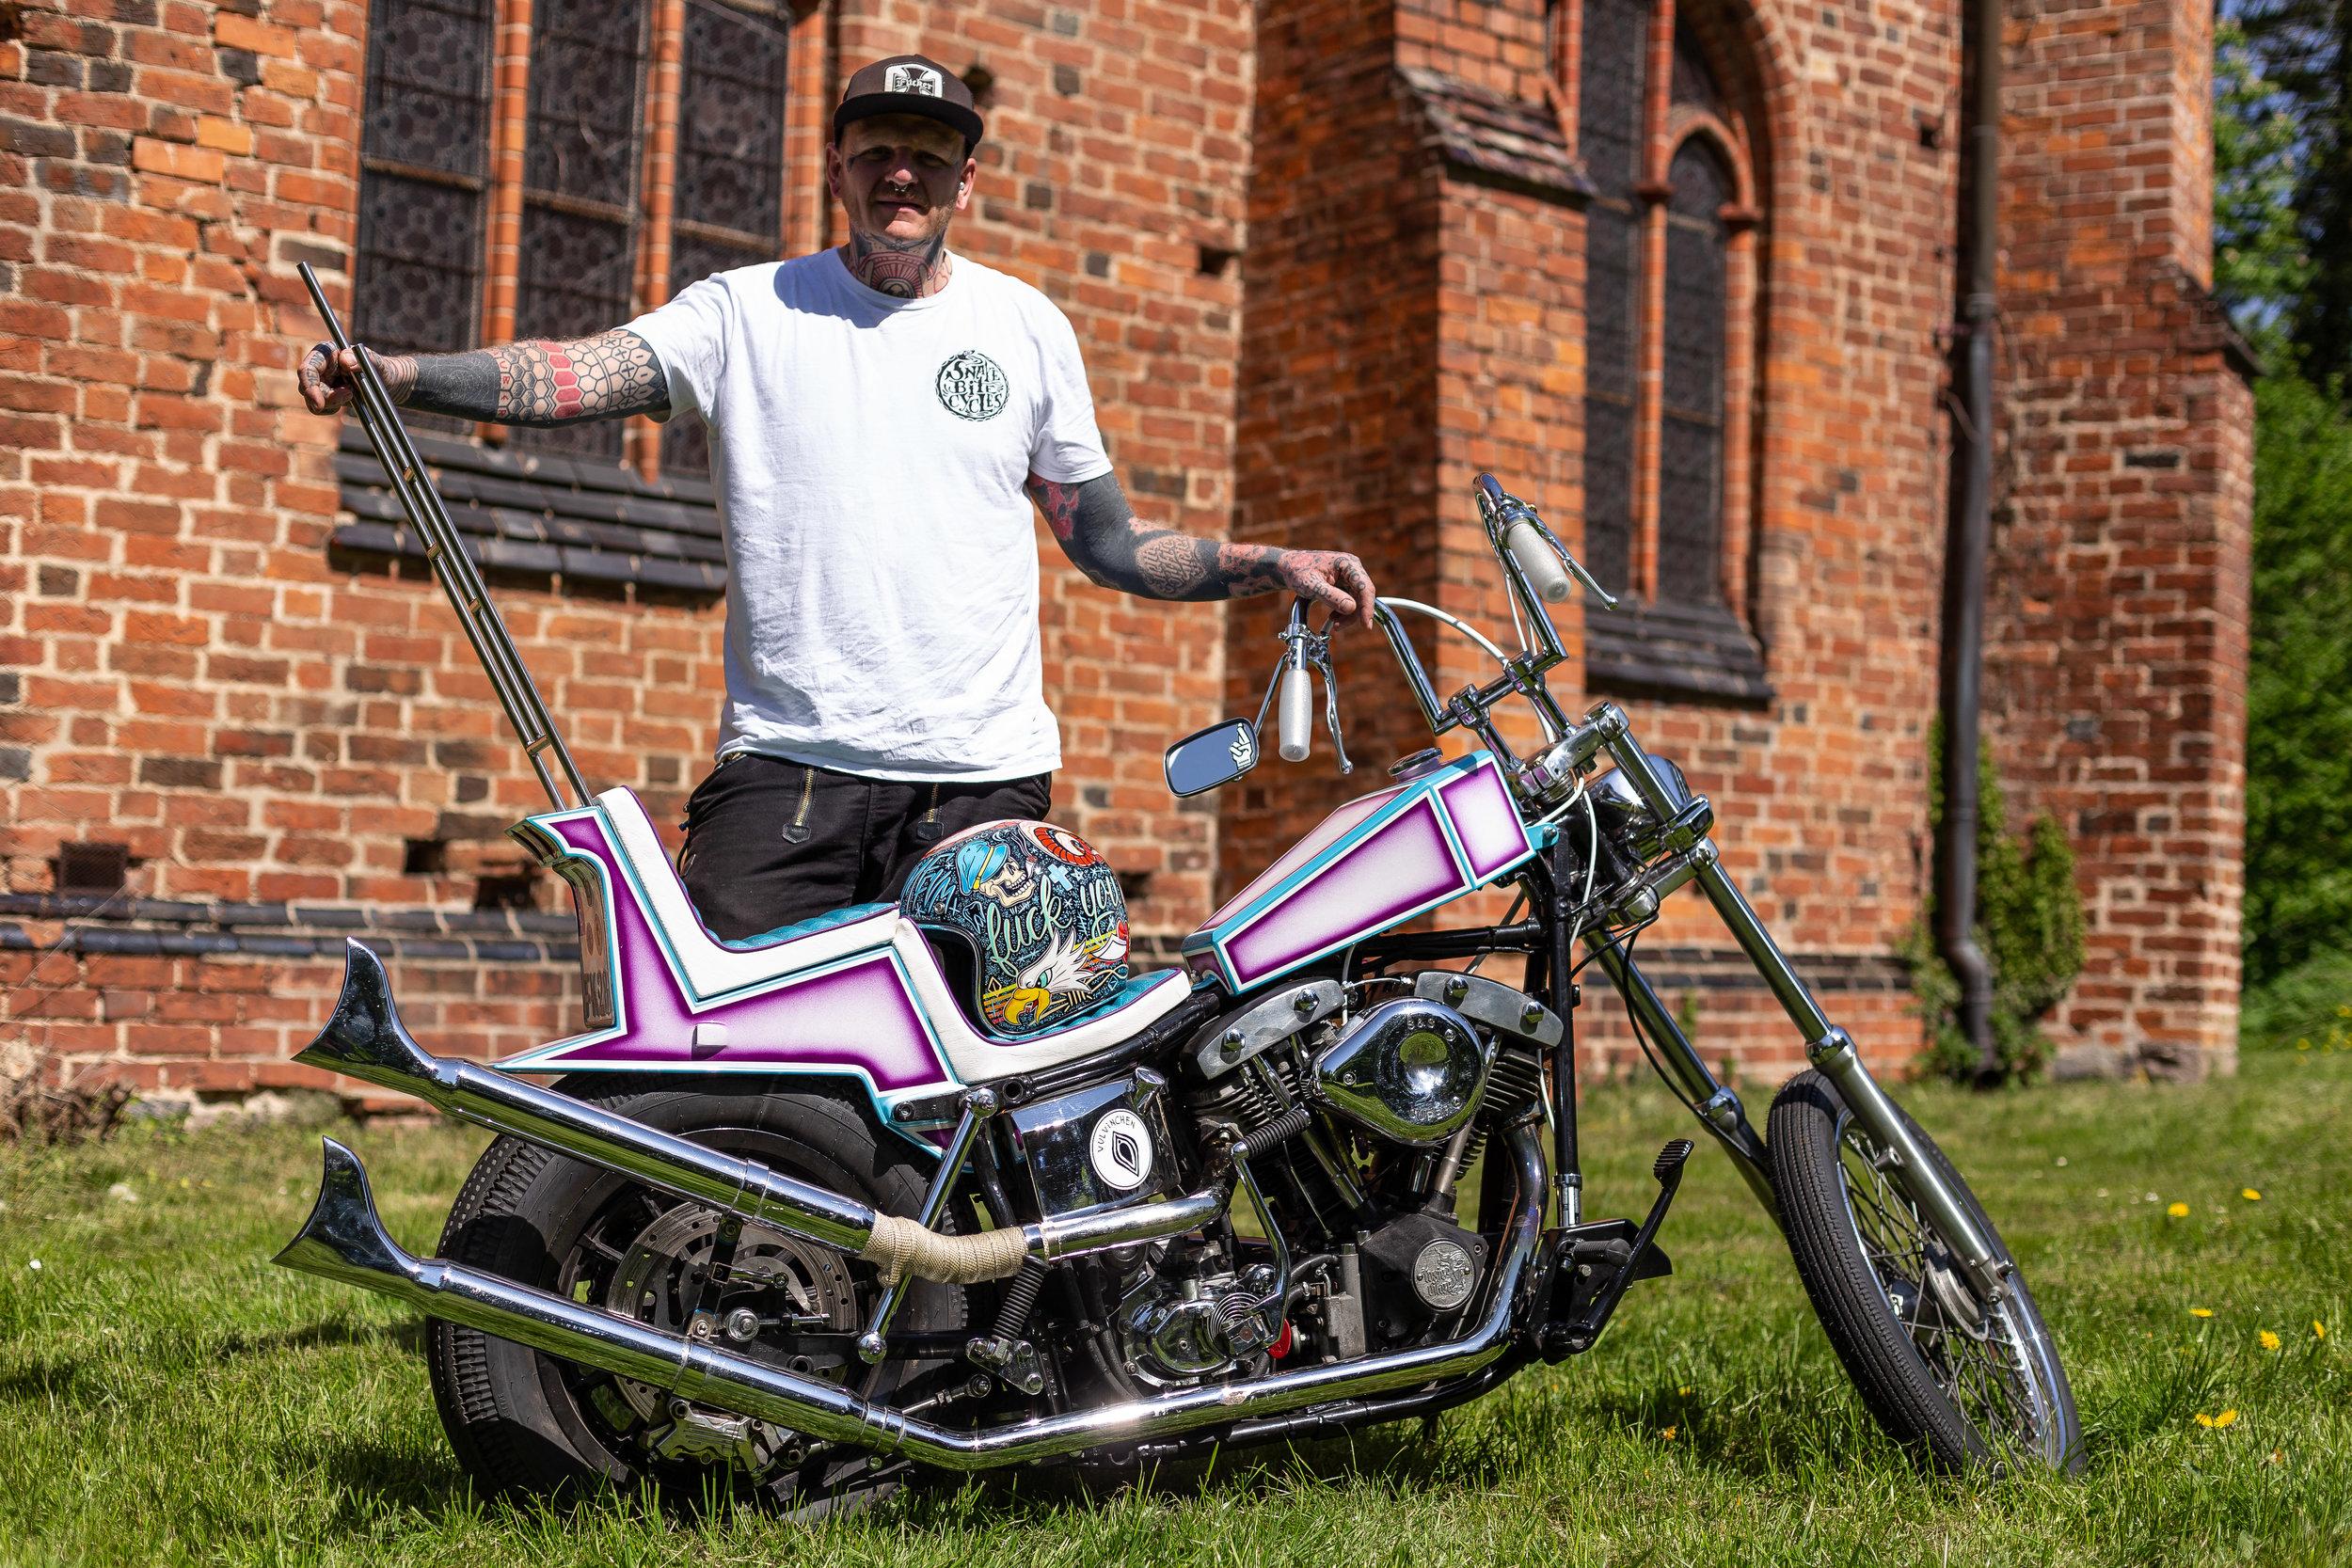 (c) Stefan Weidner Fotografie_Toxic Bikes_Karls Ofen_10-05-2018_IMG-0191.jpg